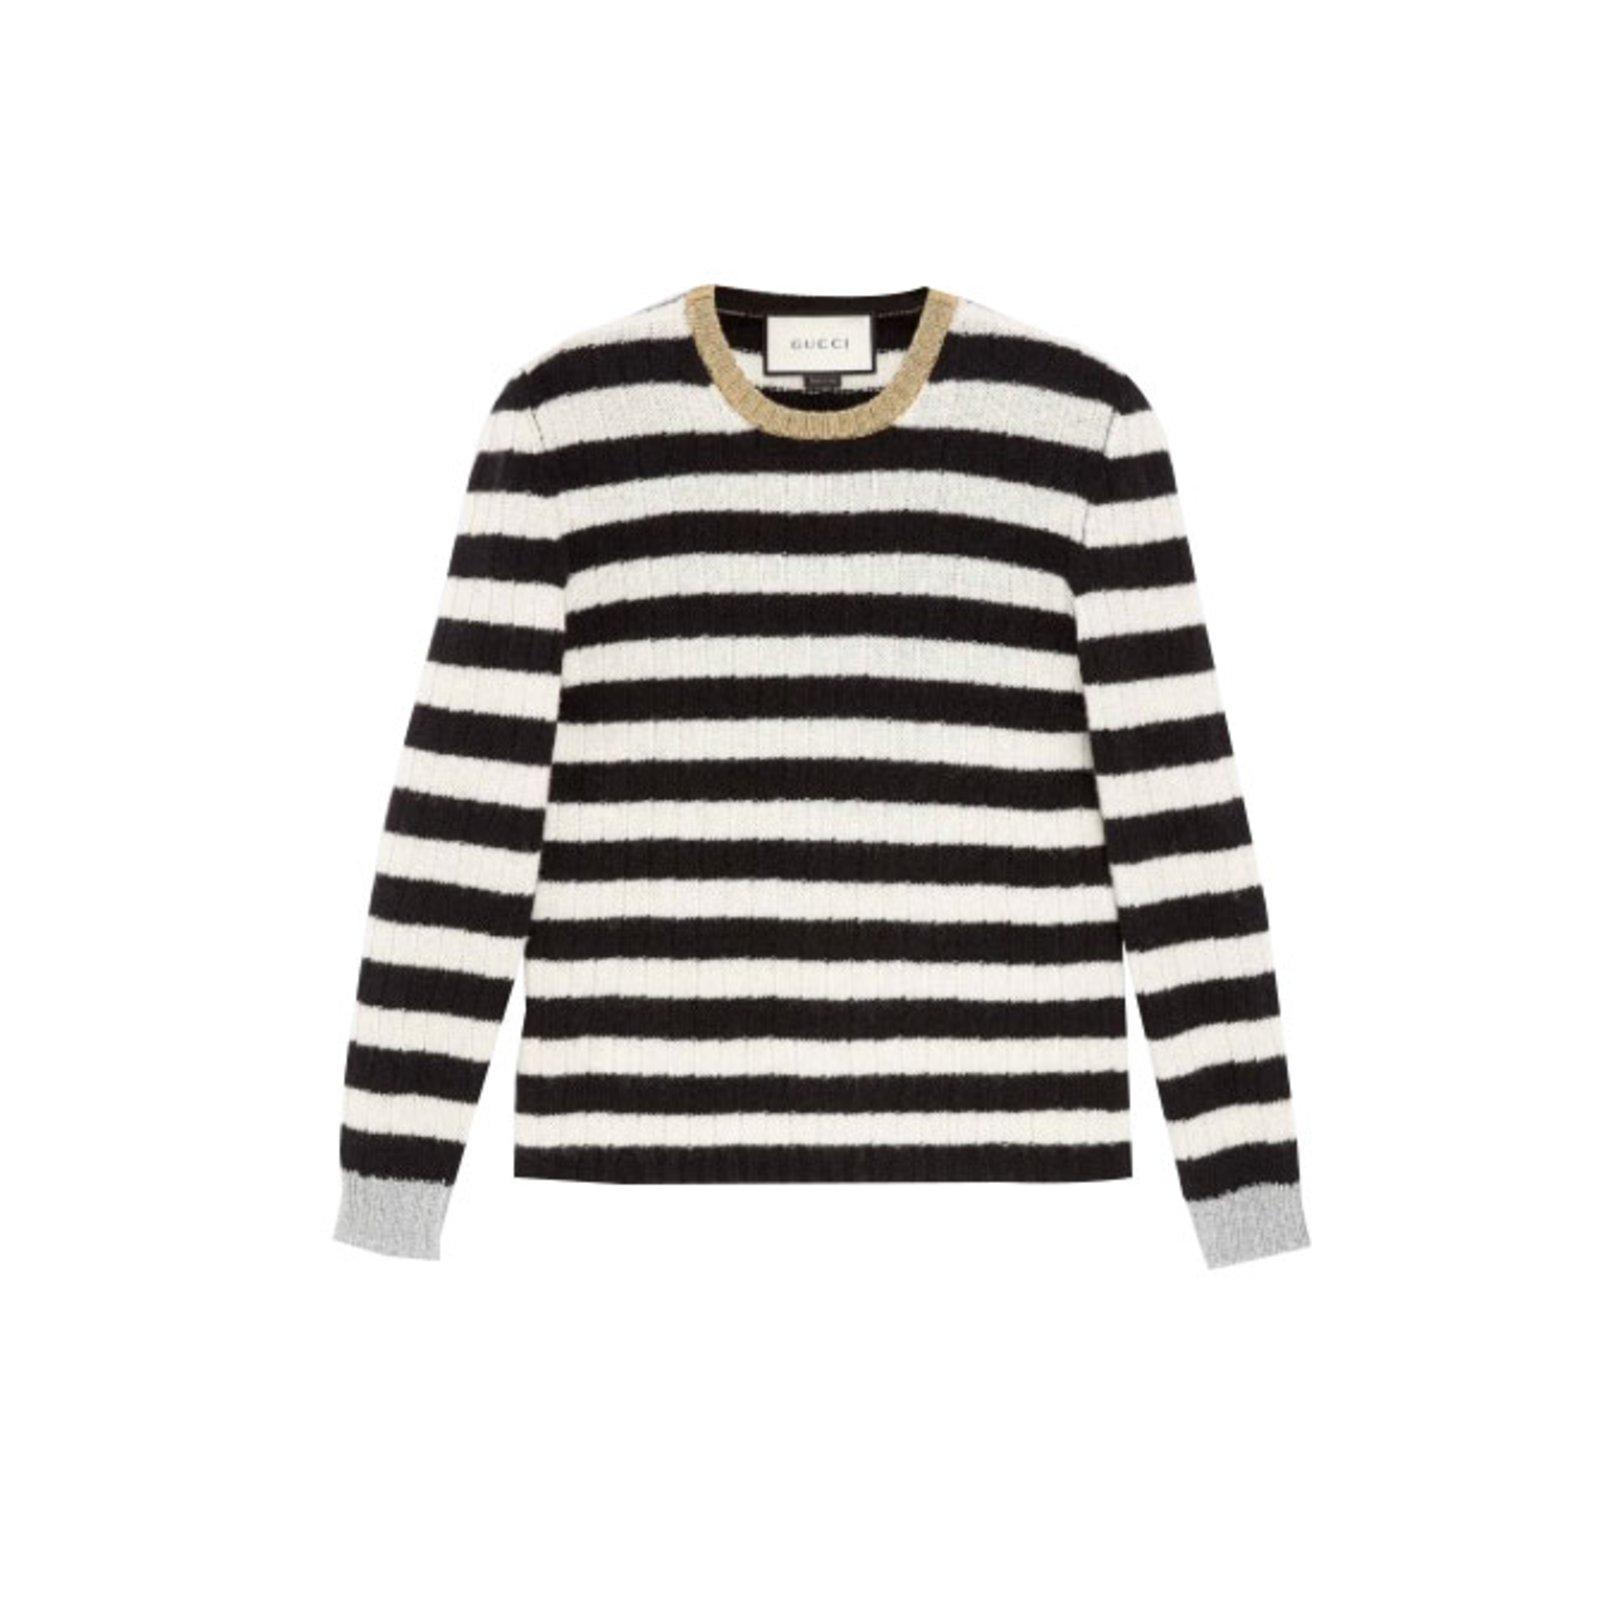 0b5dca7ce91 Gucci Sweater Knitwear Cashmere Black ref.50280 - Joli Closet